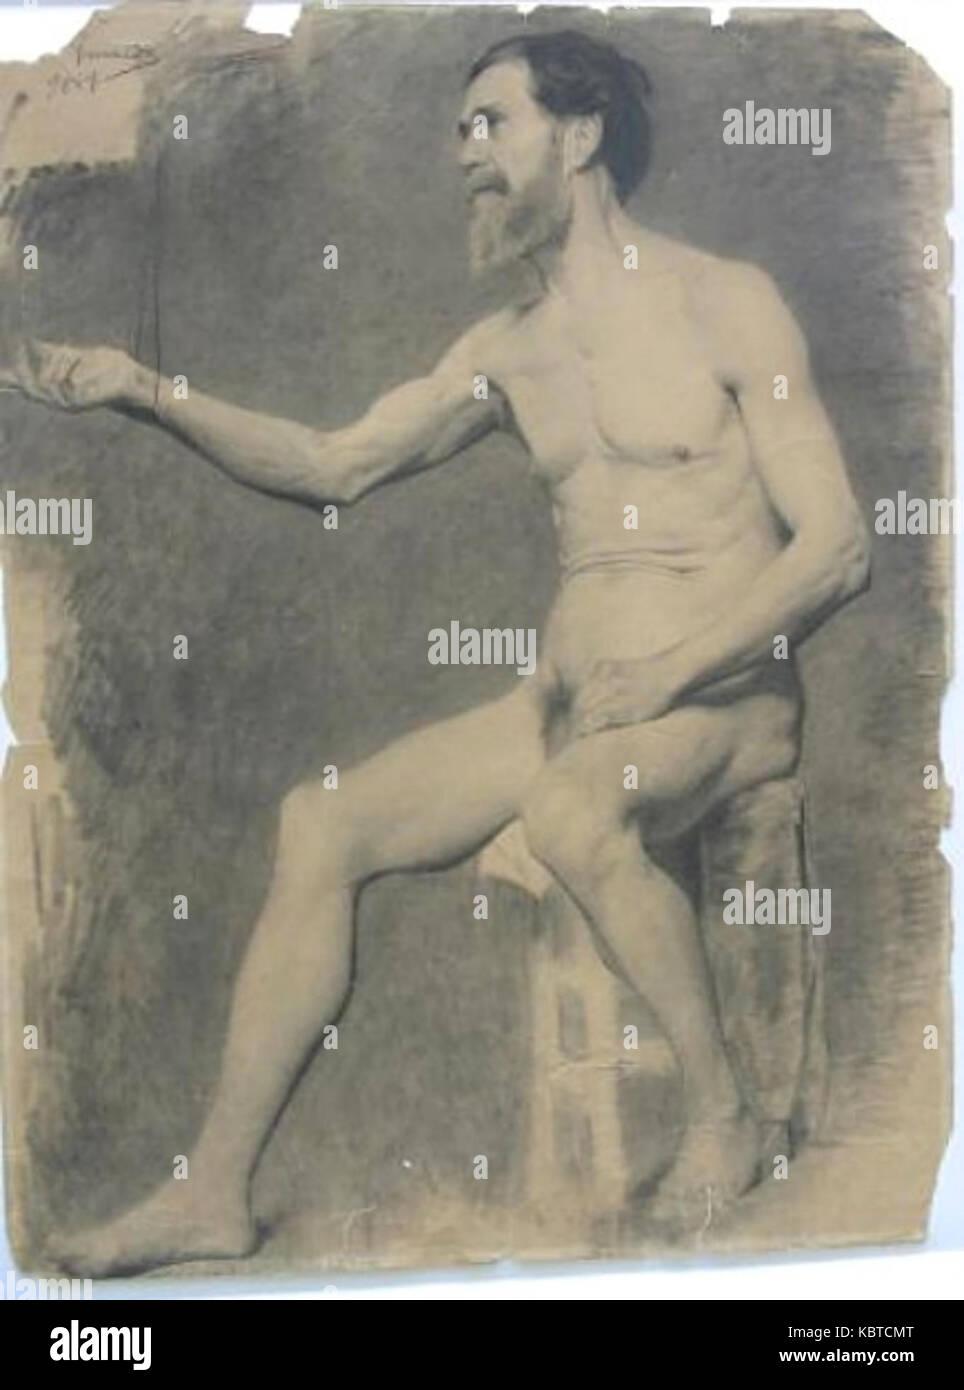 Rodolfo Amoedo Nu masculino sentado Imagen De Stock